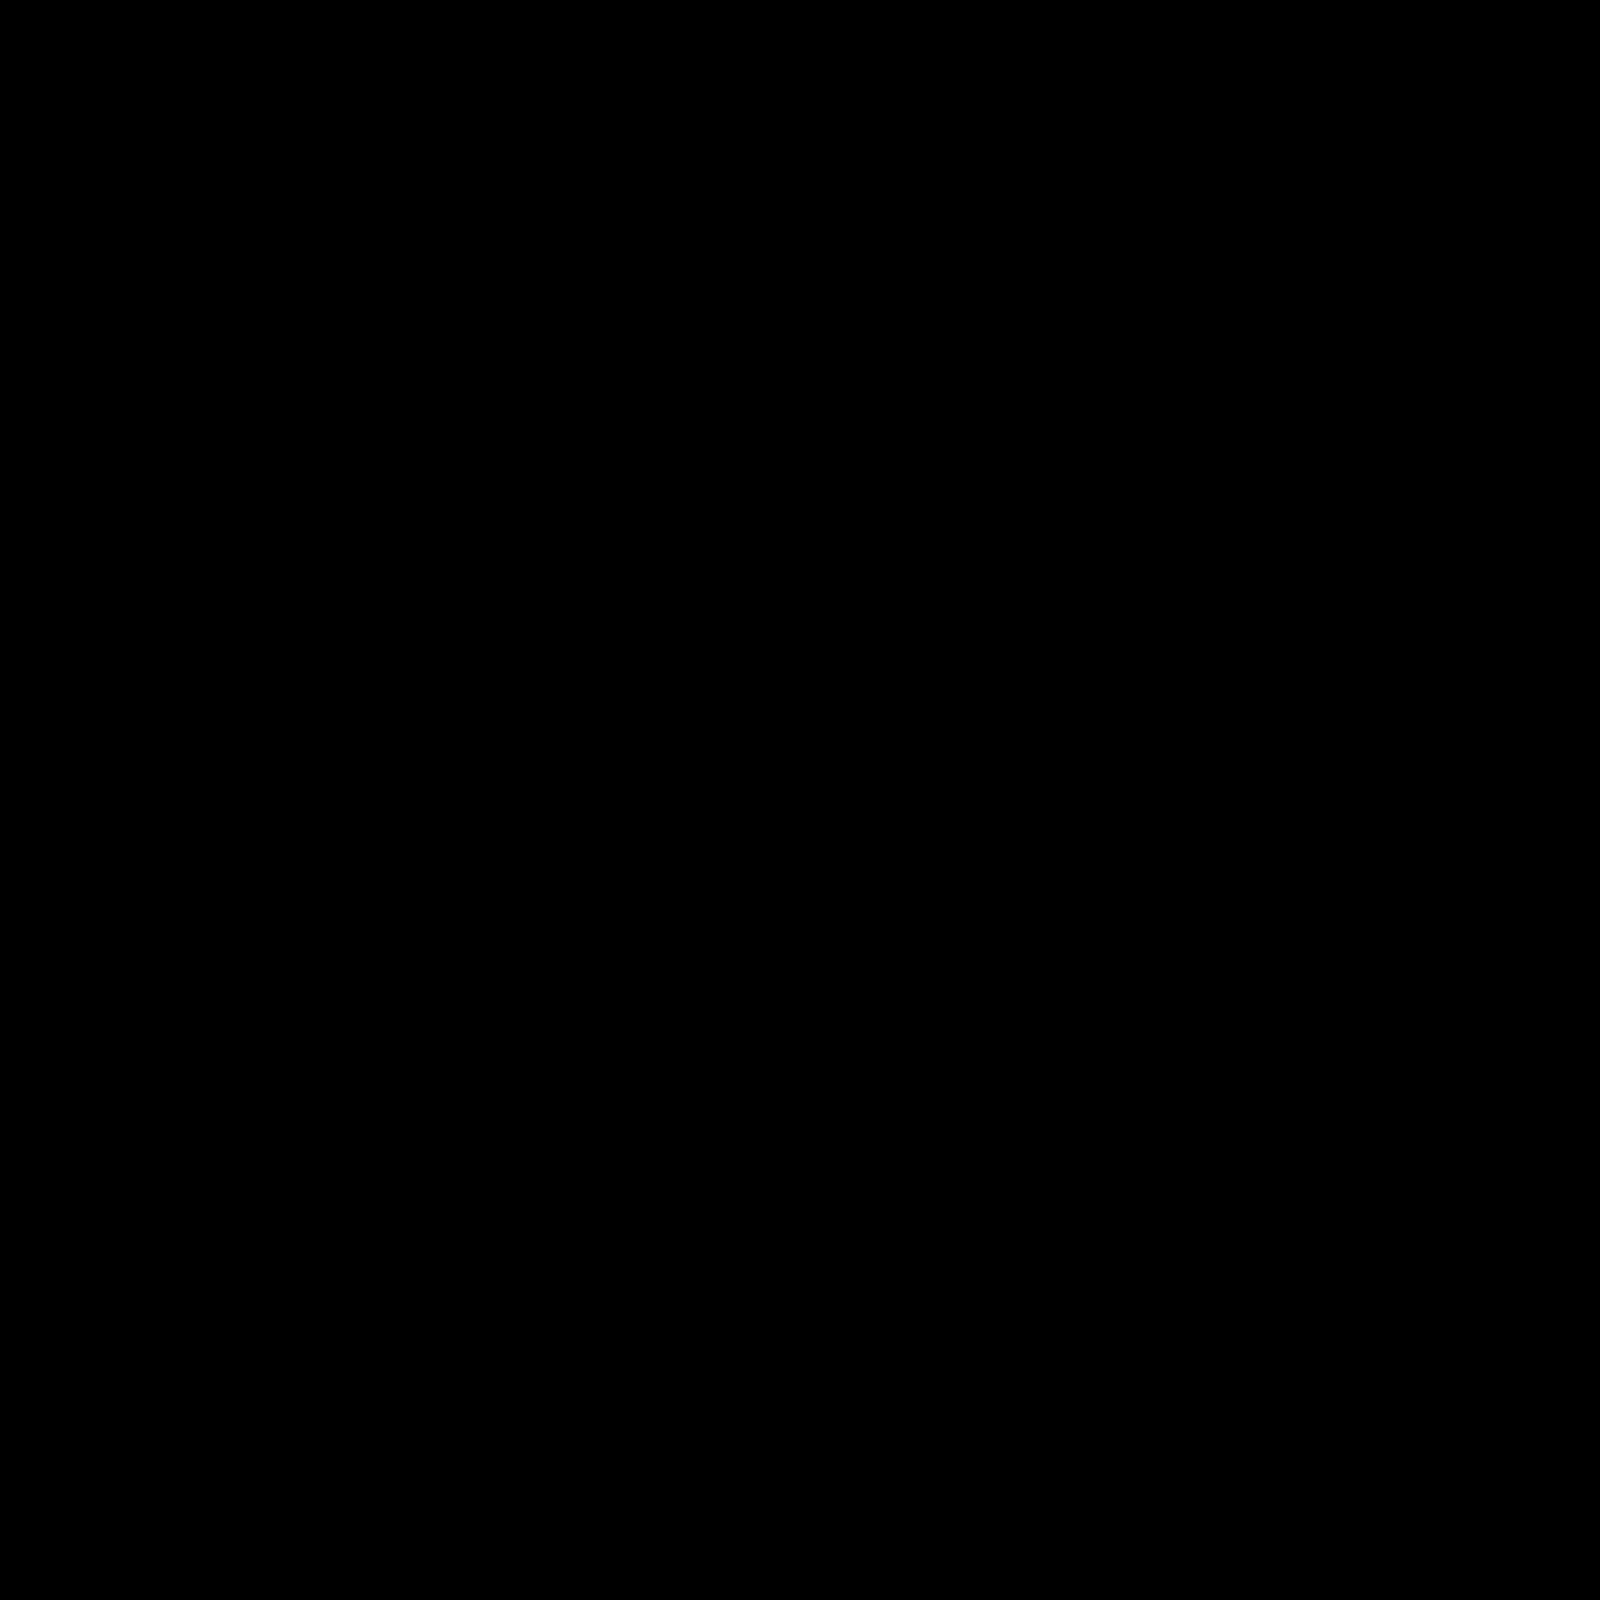 Atomic Bomb Filled icon